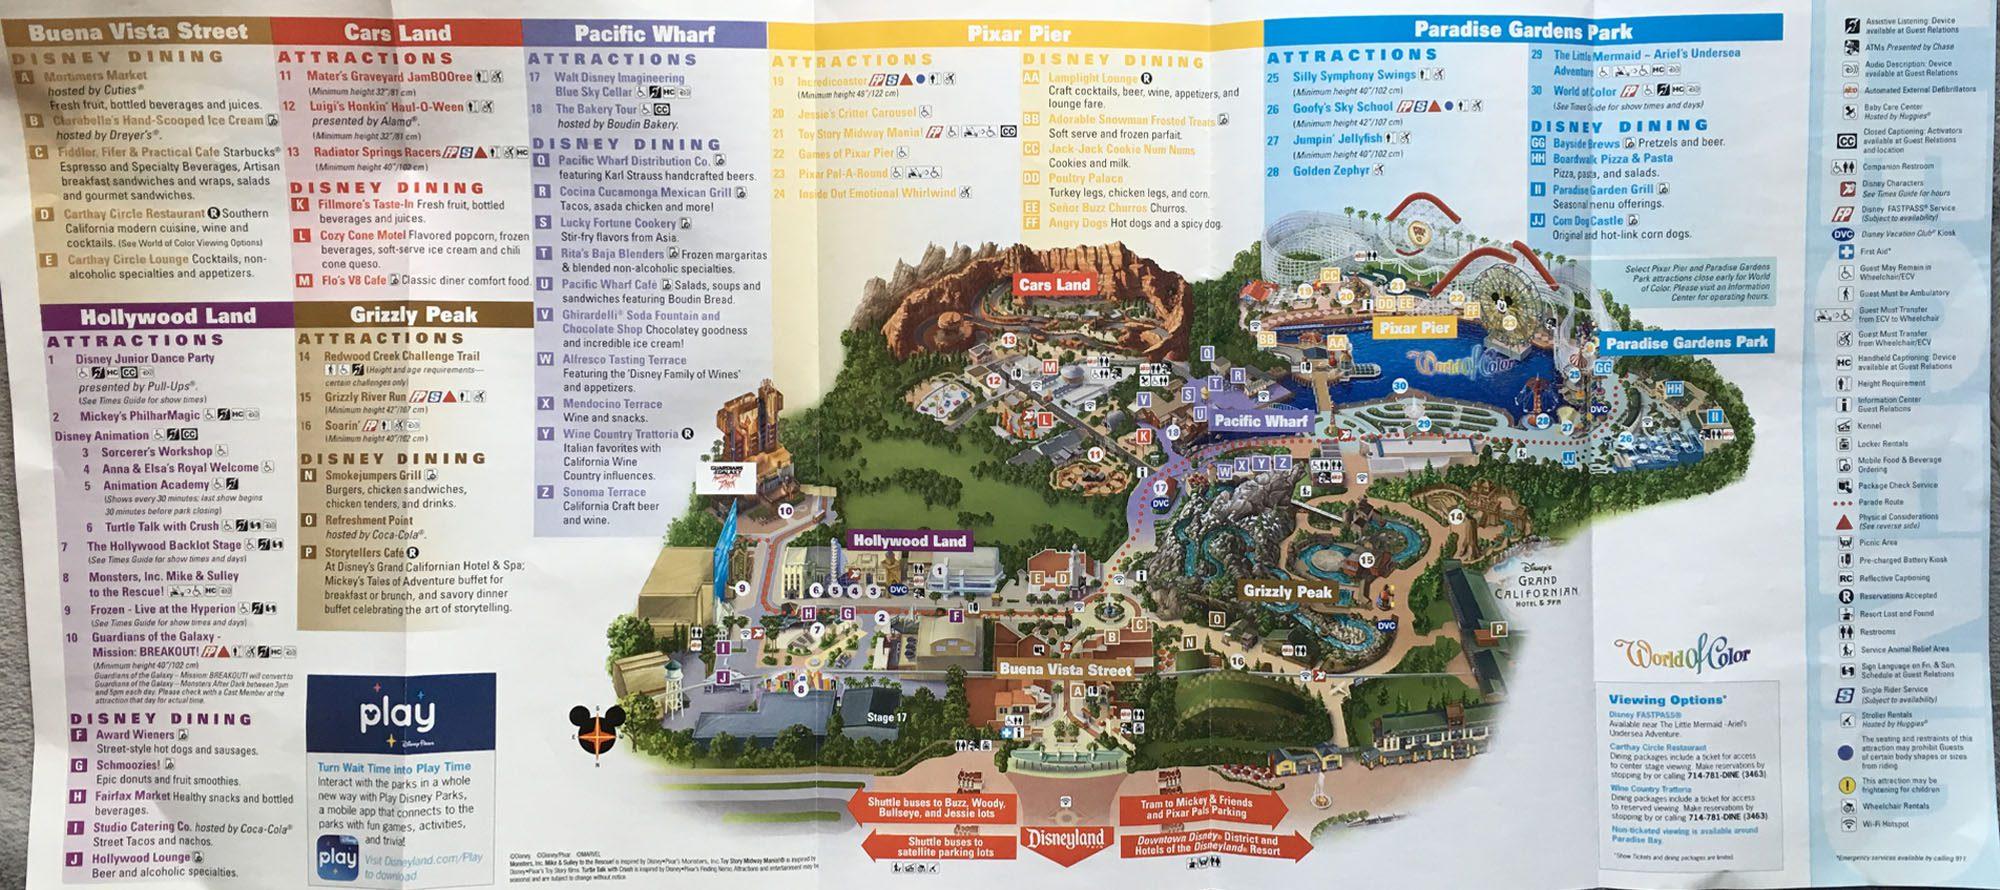 2019 Halloween Time Disney California Adventure Park Map